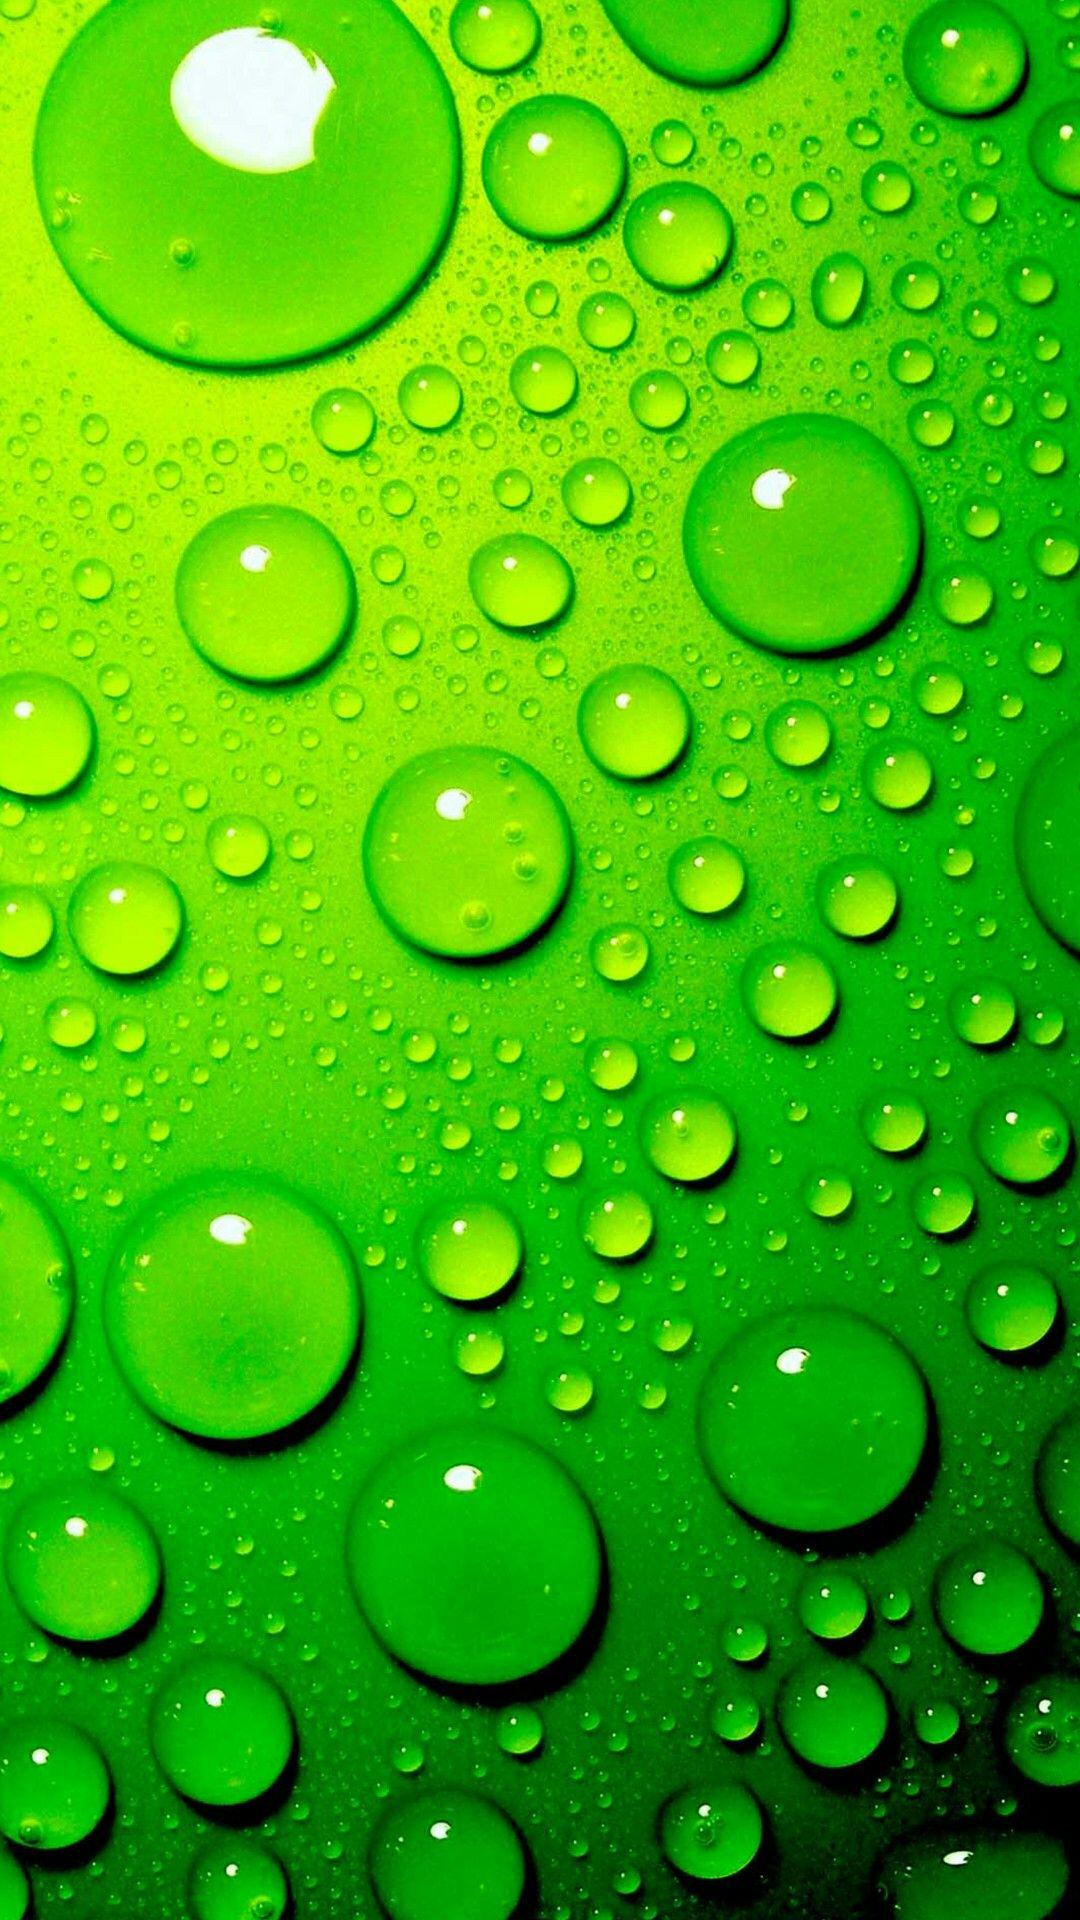 Pin By Soumya Das Som On Art All Kind Bubbles Wallpaper Green Wallpaper Green Bubble Hd wallpaper lime slice bubbles macro